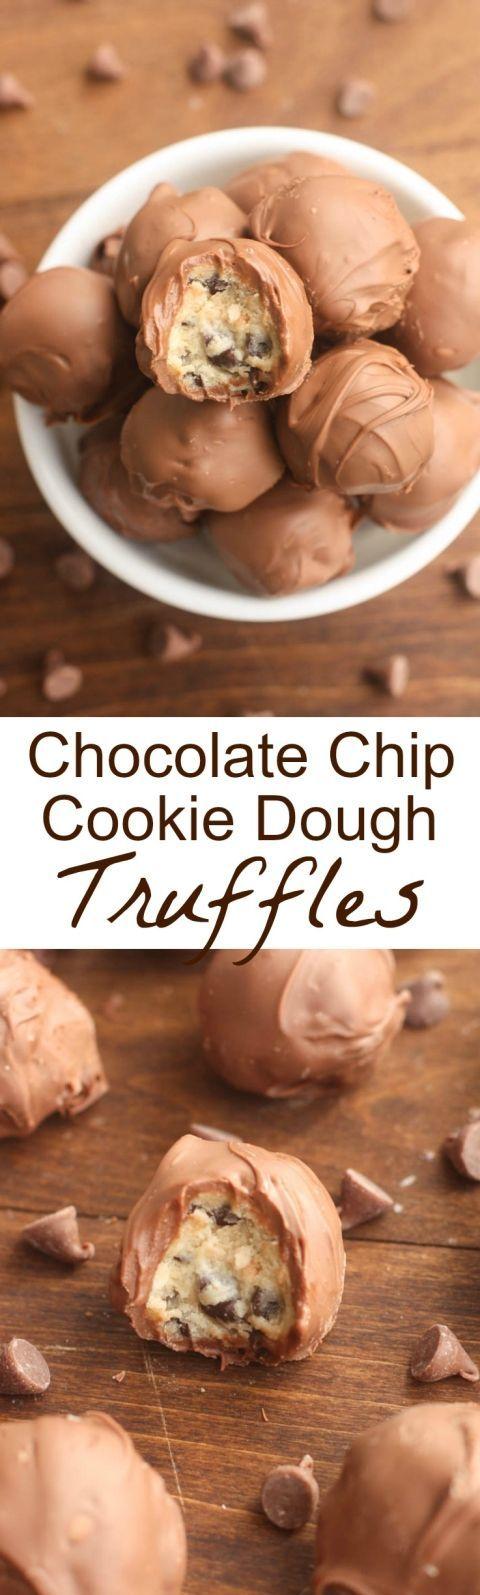 Chocolate Chip Cookie Dough Truffles Recipe